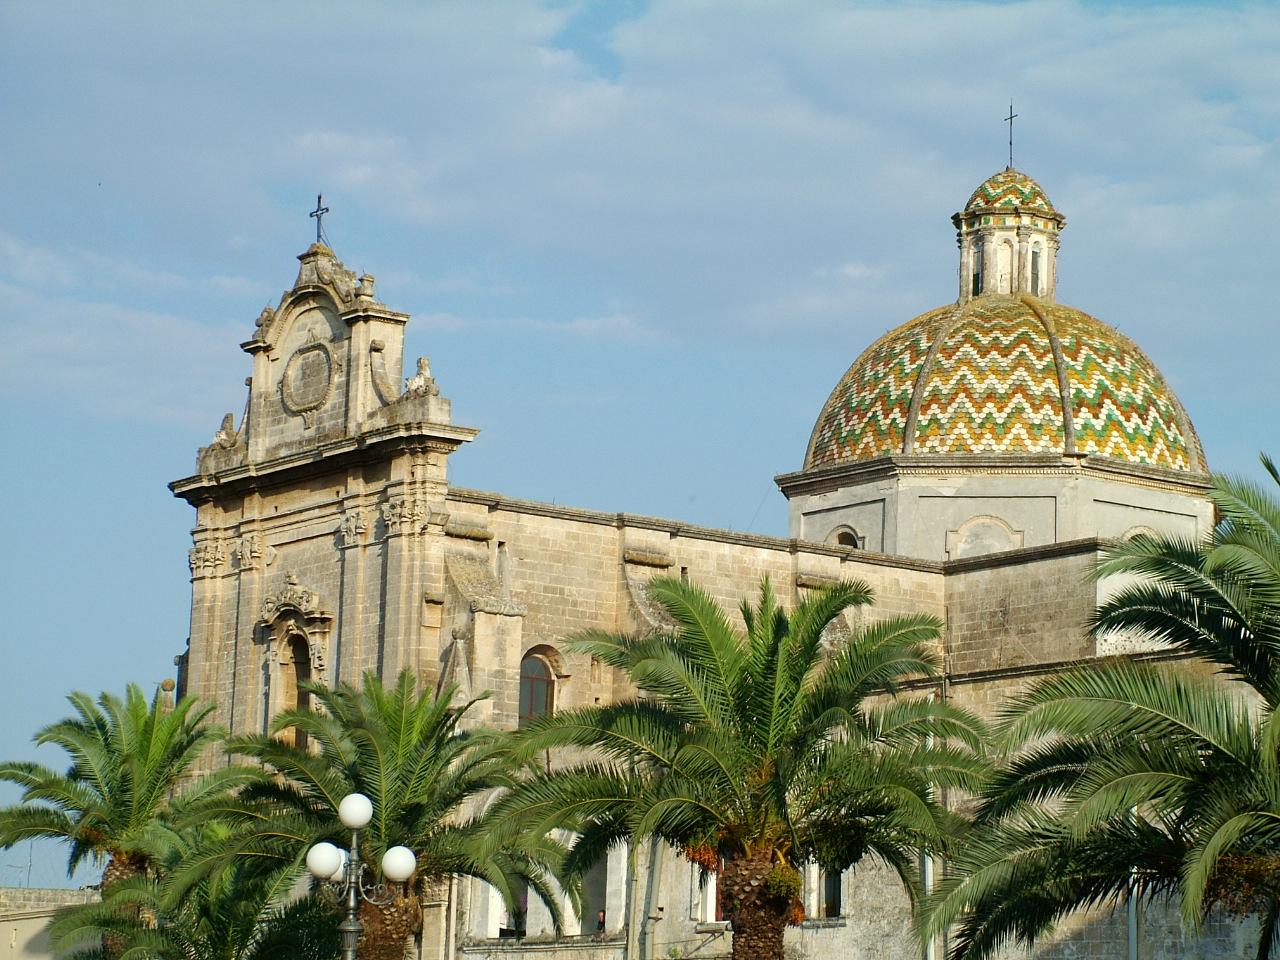 Risultati immagini per chiesa di Santa maria di costantinopoli manduria